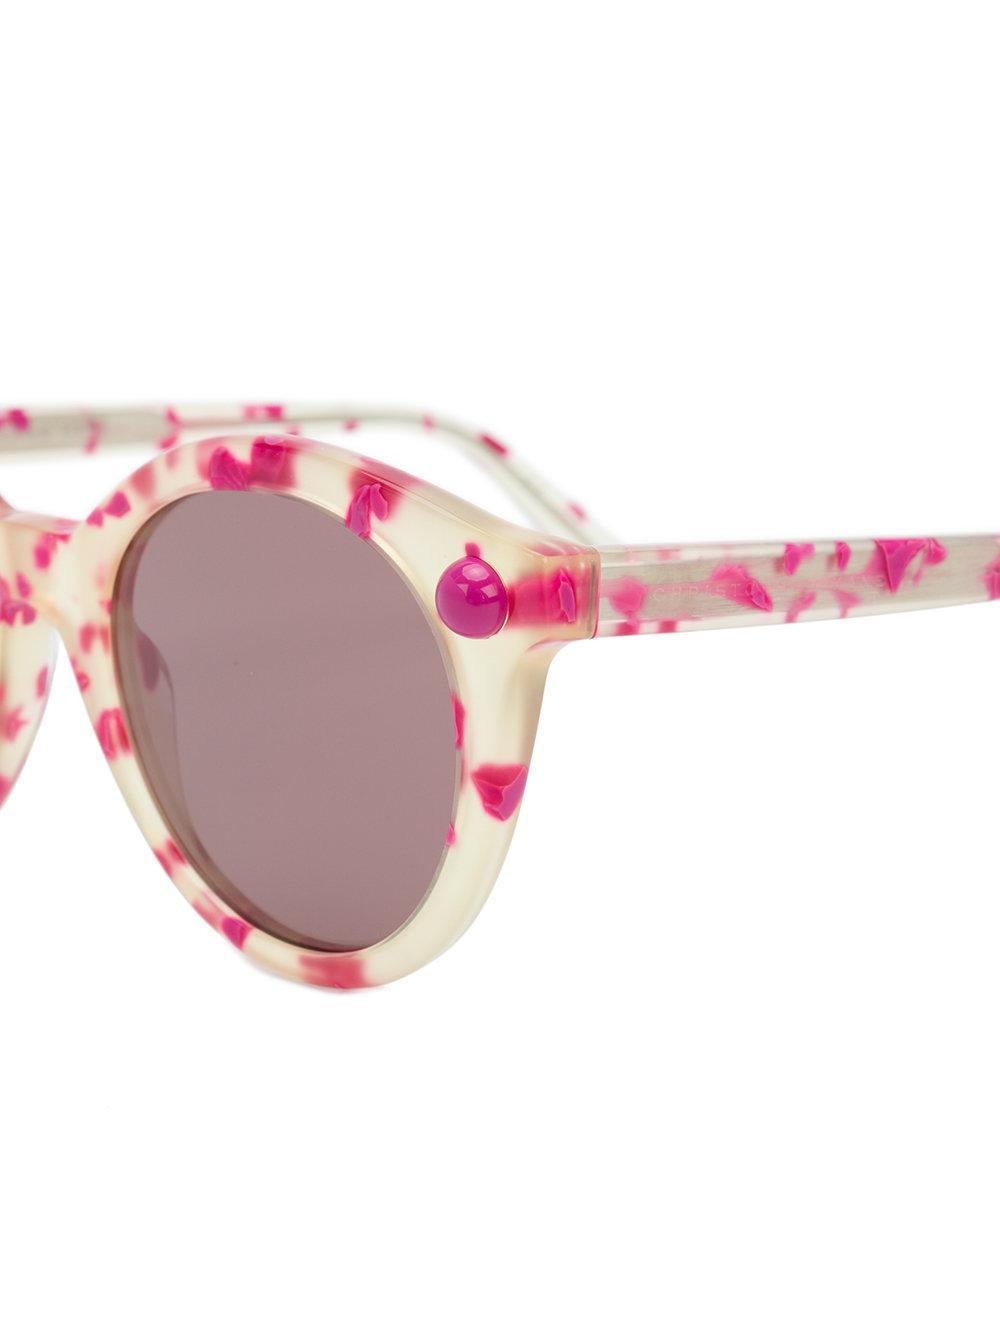 sol montura moteada de Eyewear redonda Gafas Christopher Kane con RpwBqW1F